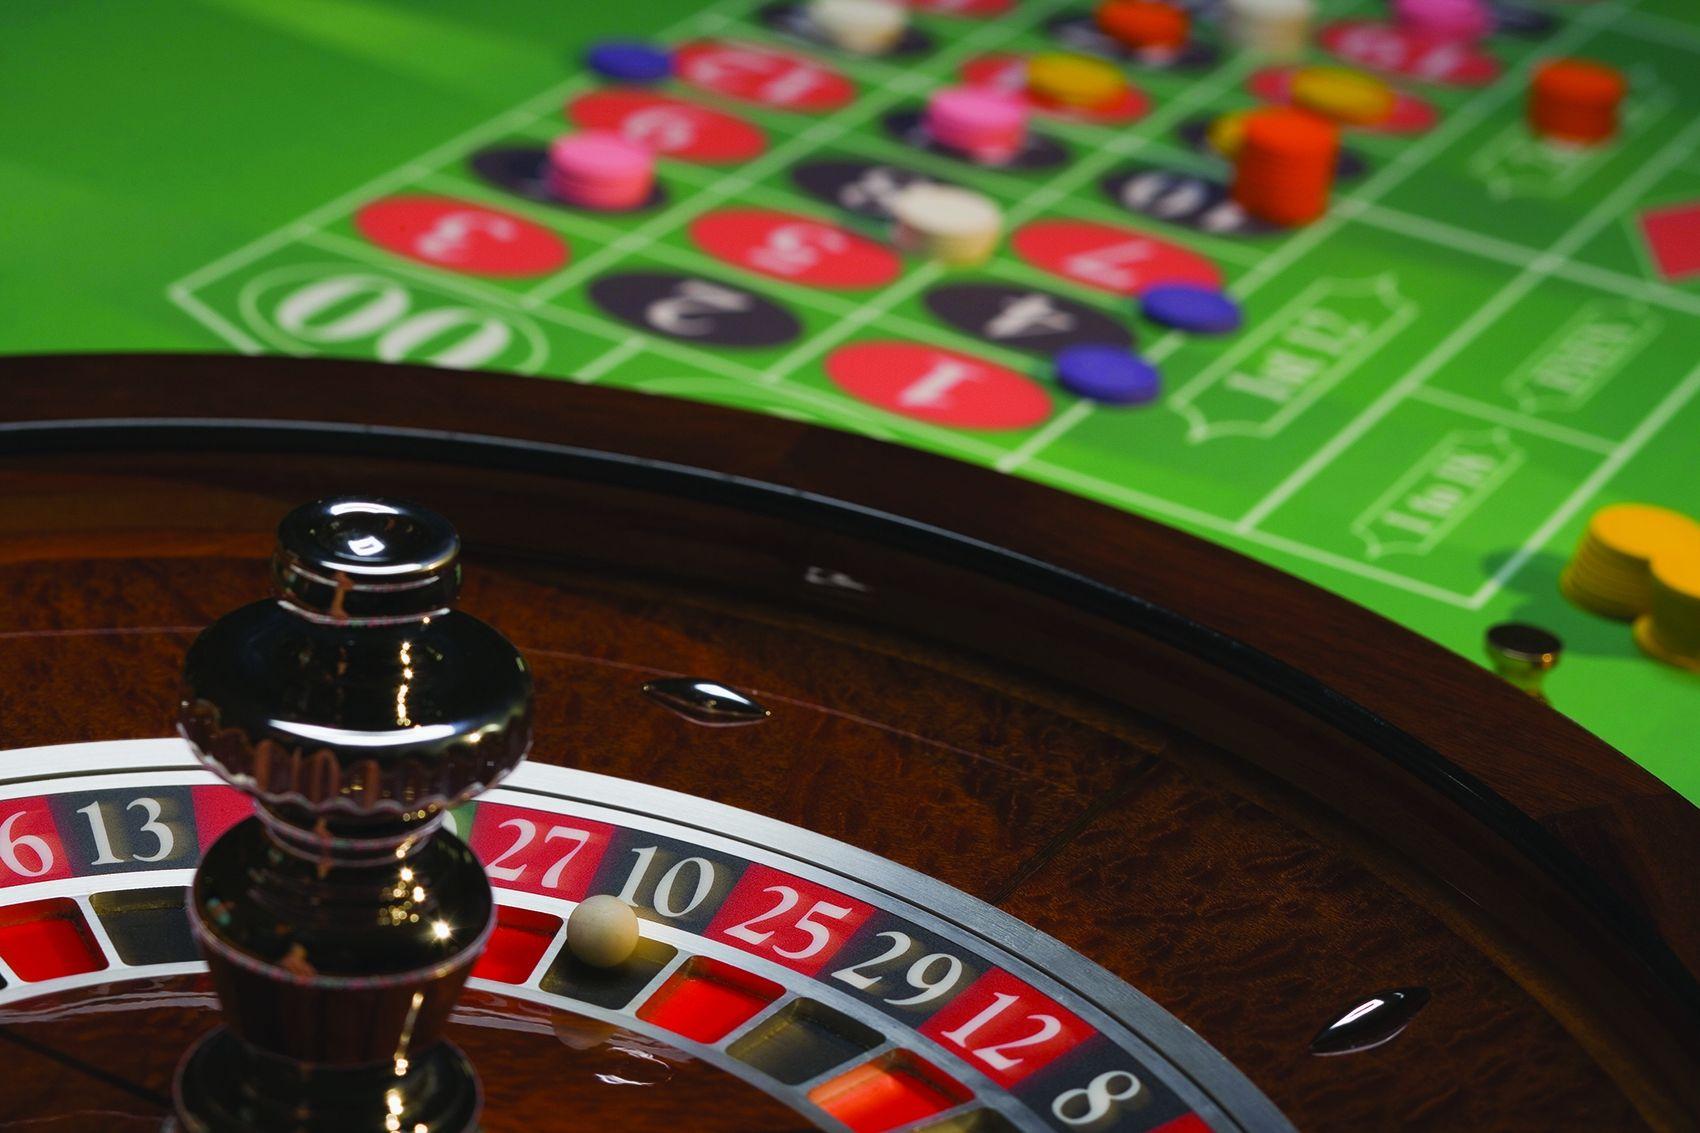 Gambling testimony ameristar archive blog casino comment html